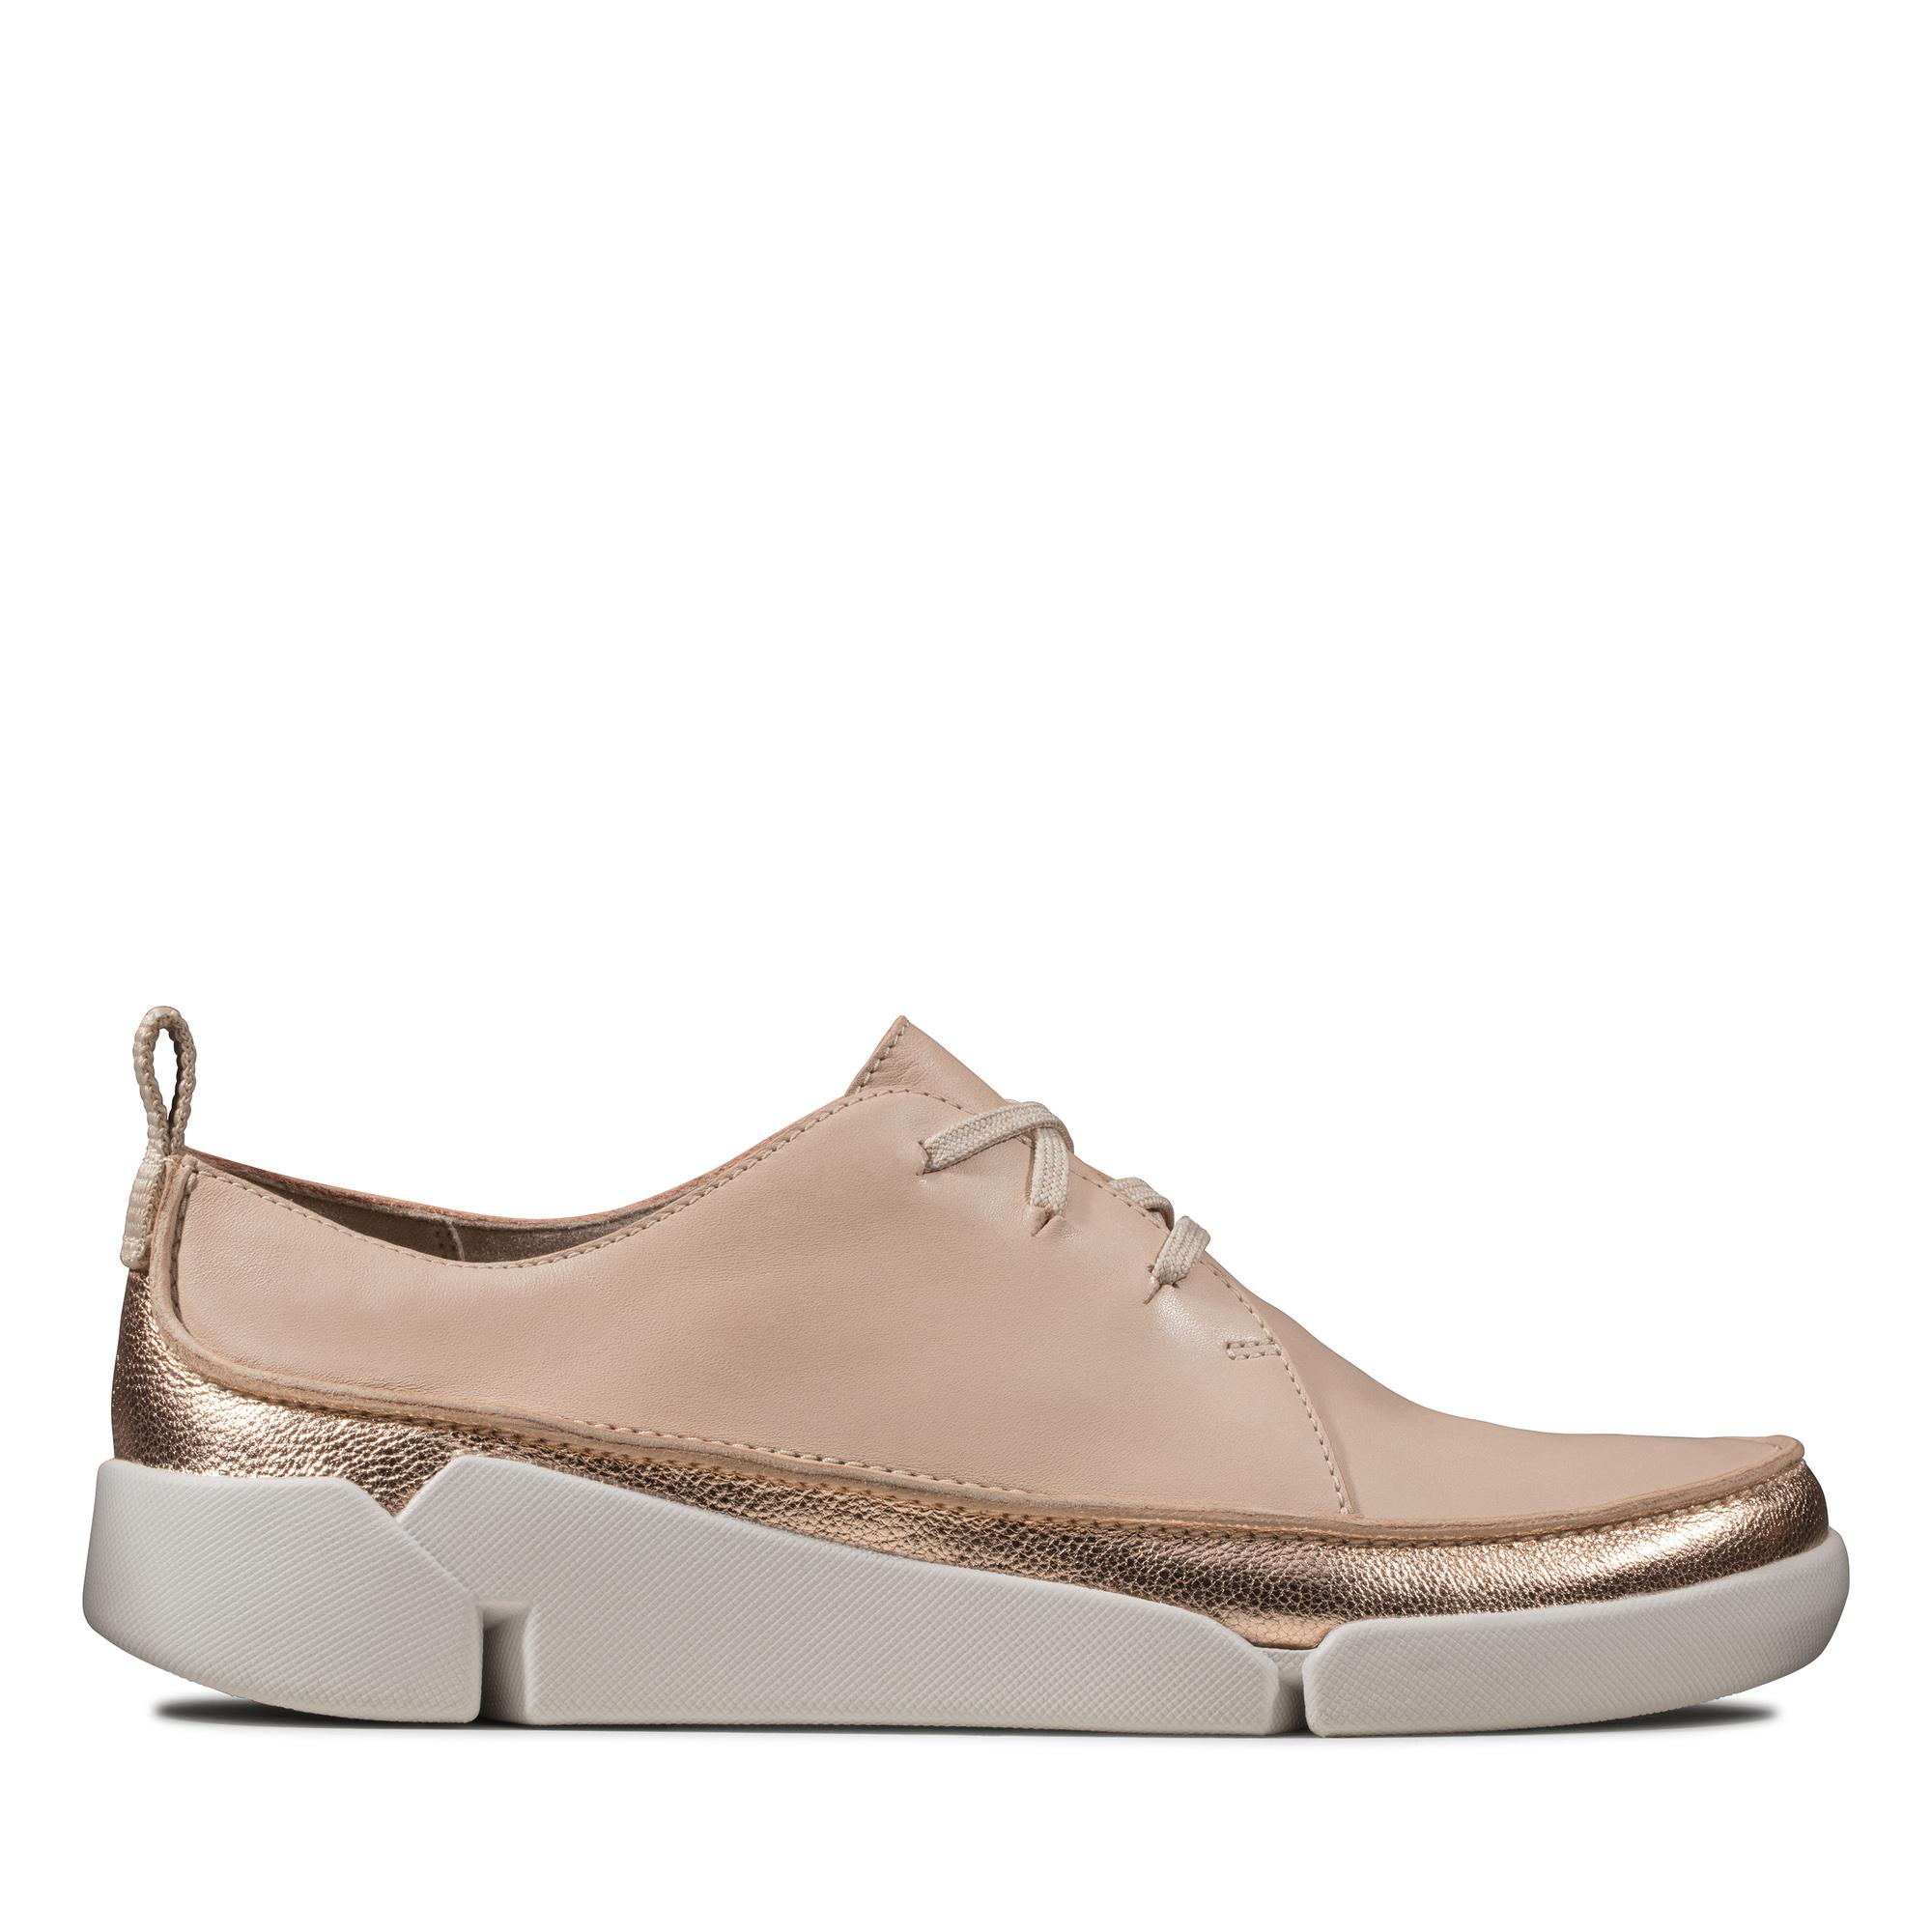 Clarks Ladies Lace Up Shoes /'Tri Clara/'